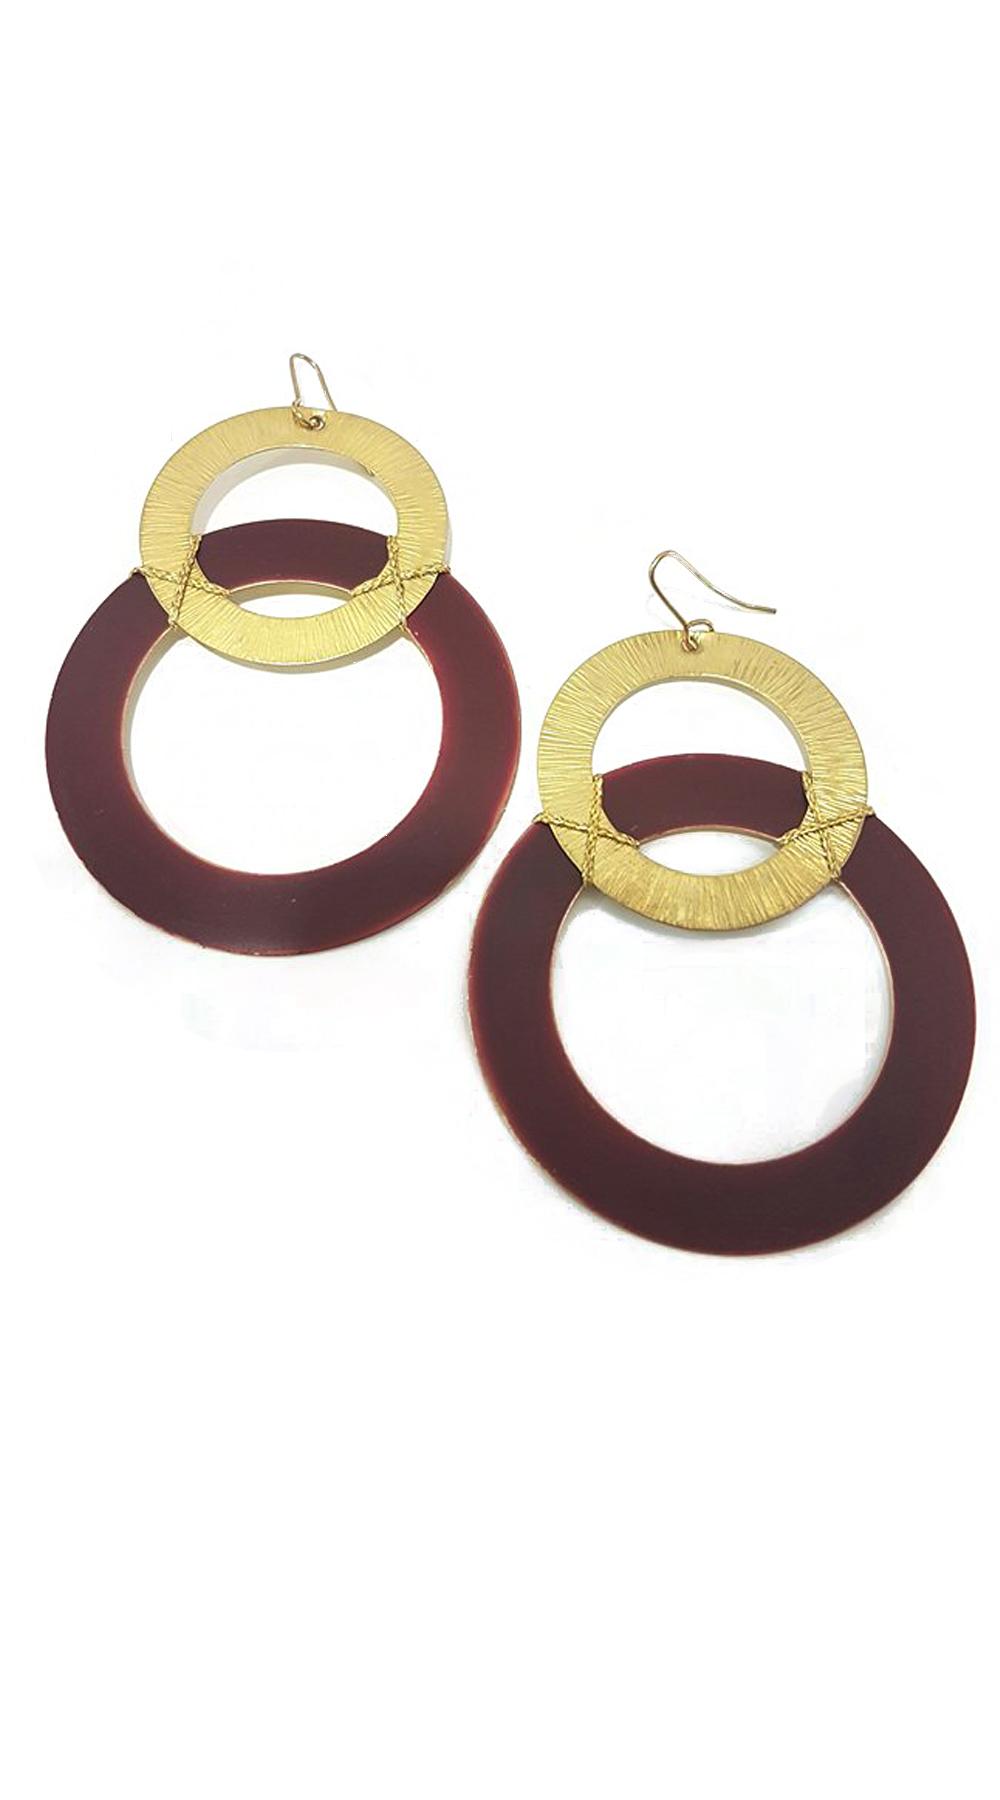 Handmade σκουλαρίκια circle chain - MissReina - FA17AC-202c2 κοσμήματα σκουλαρίκια